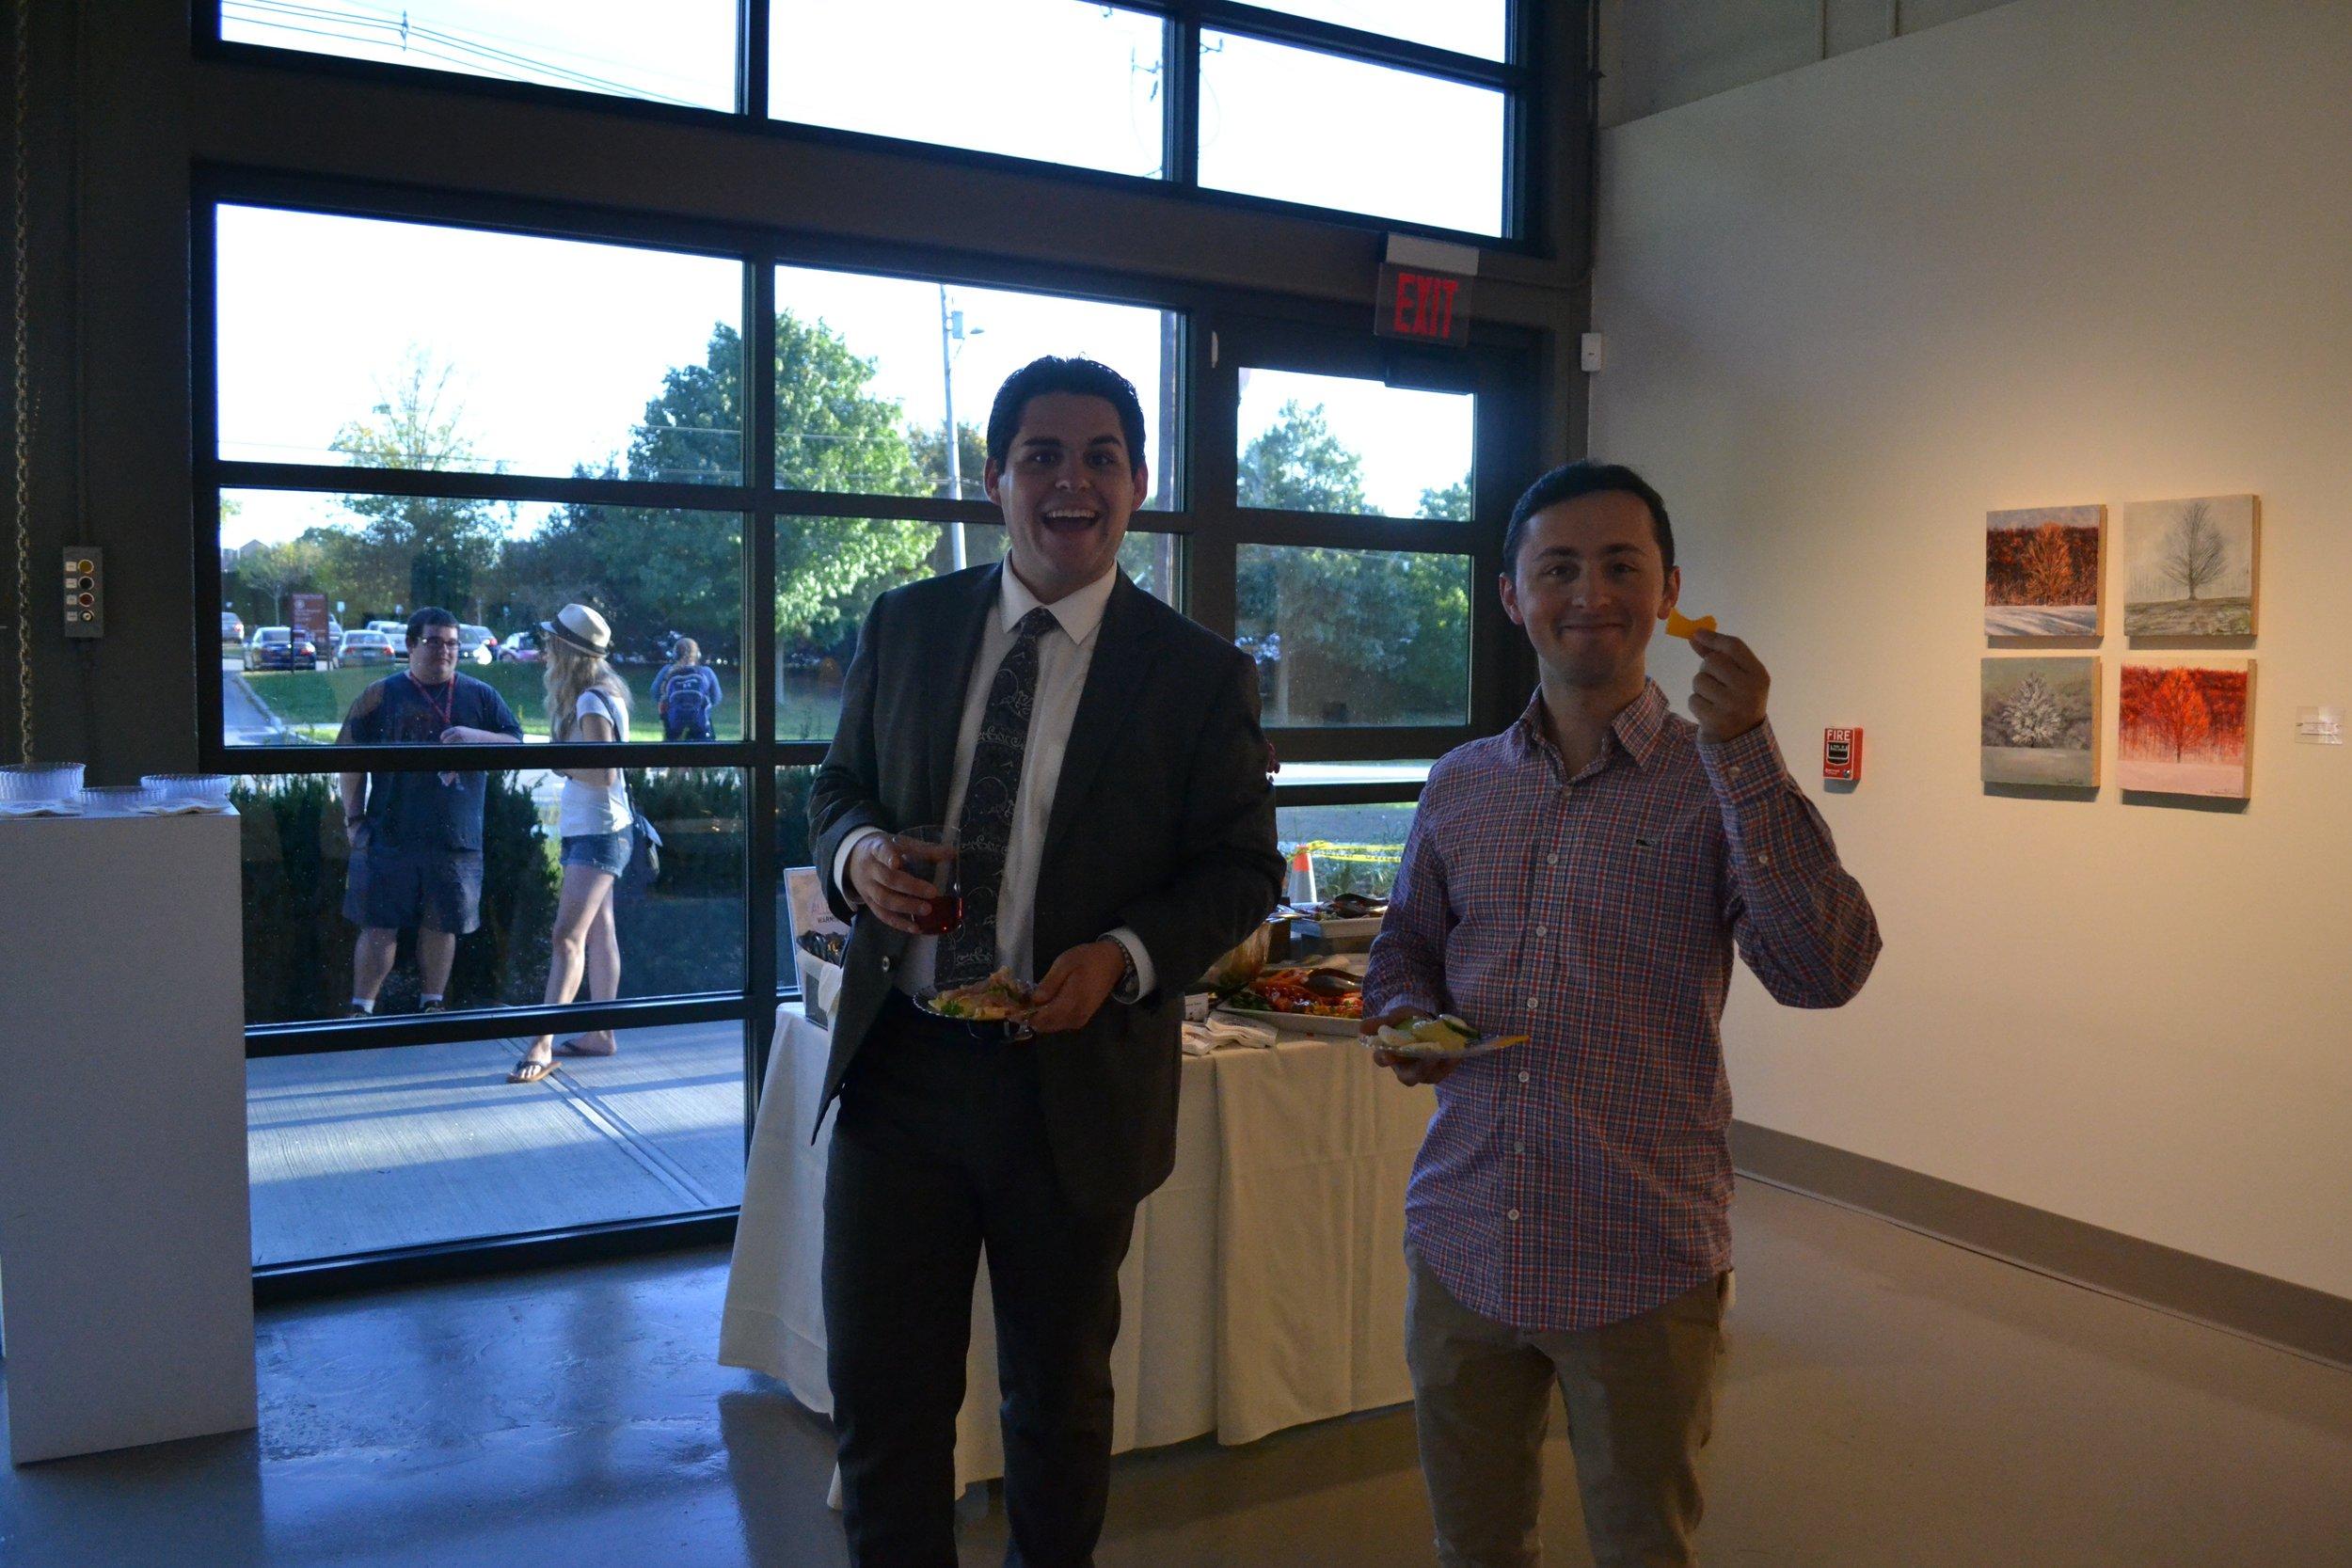 Seniors Salvatore Isola (Left) and Joseph Kopp (Right) enjoying the gallery and some refreshments.